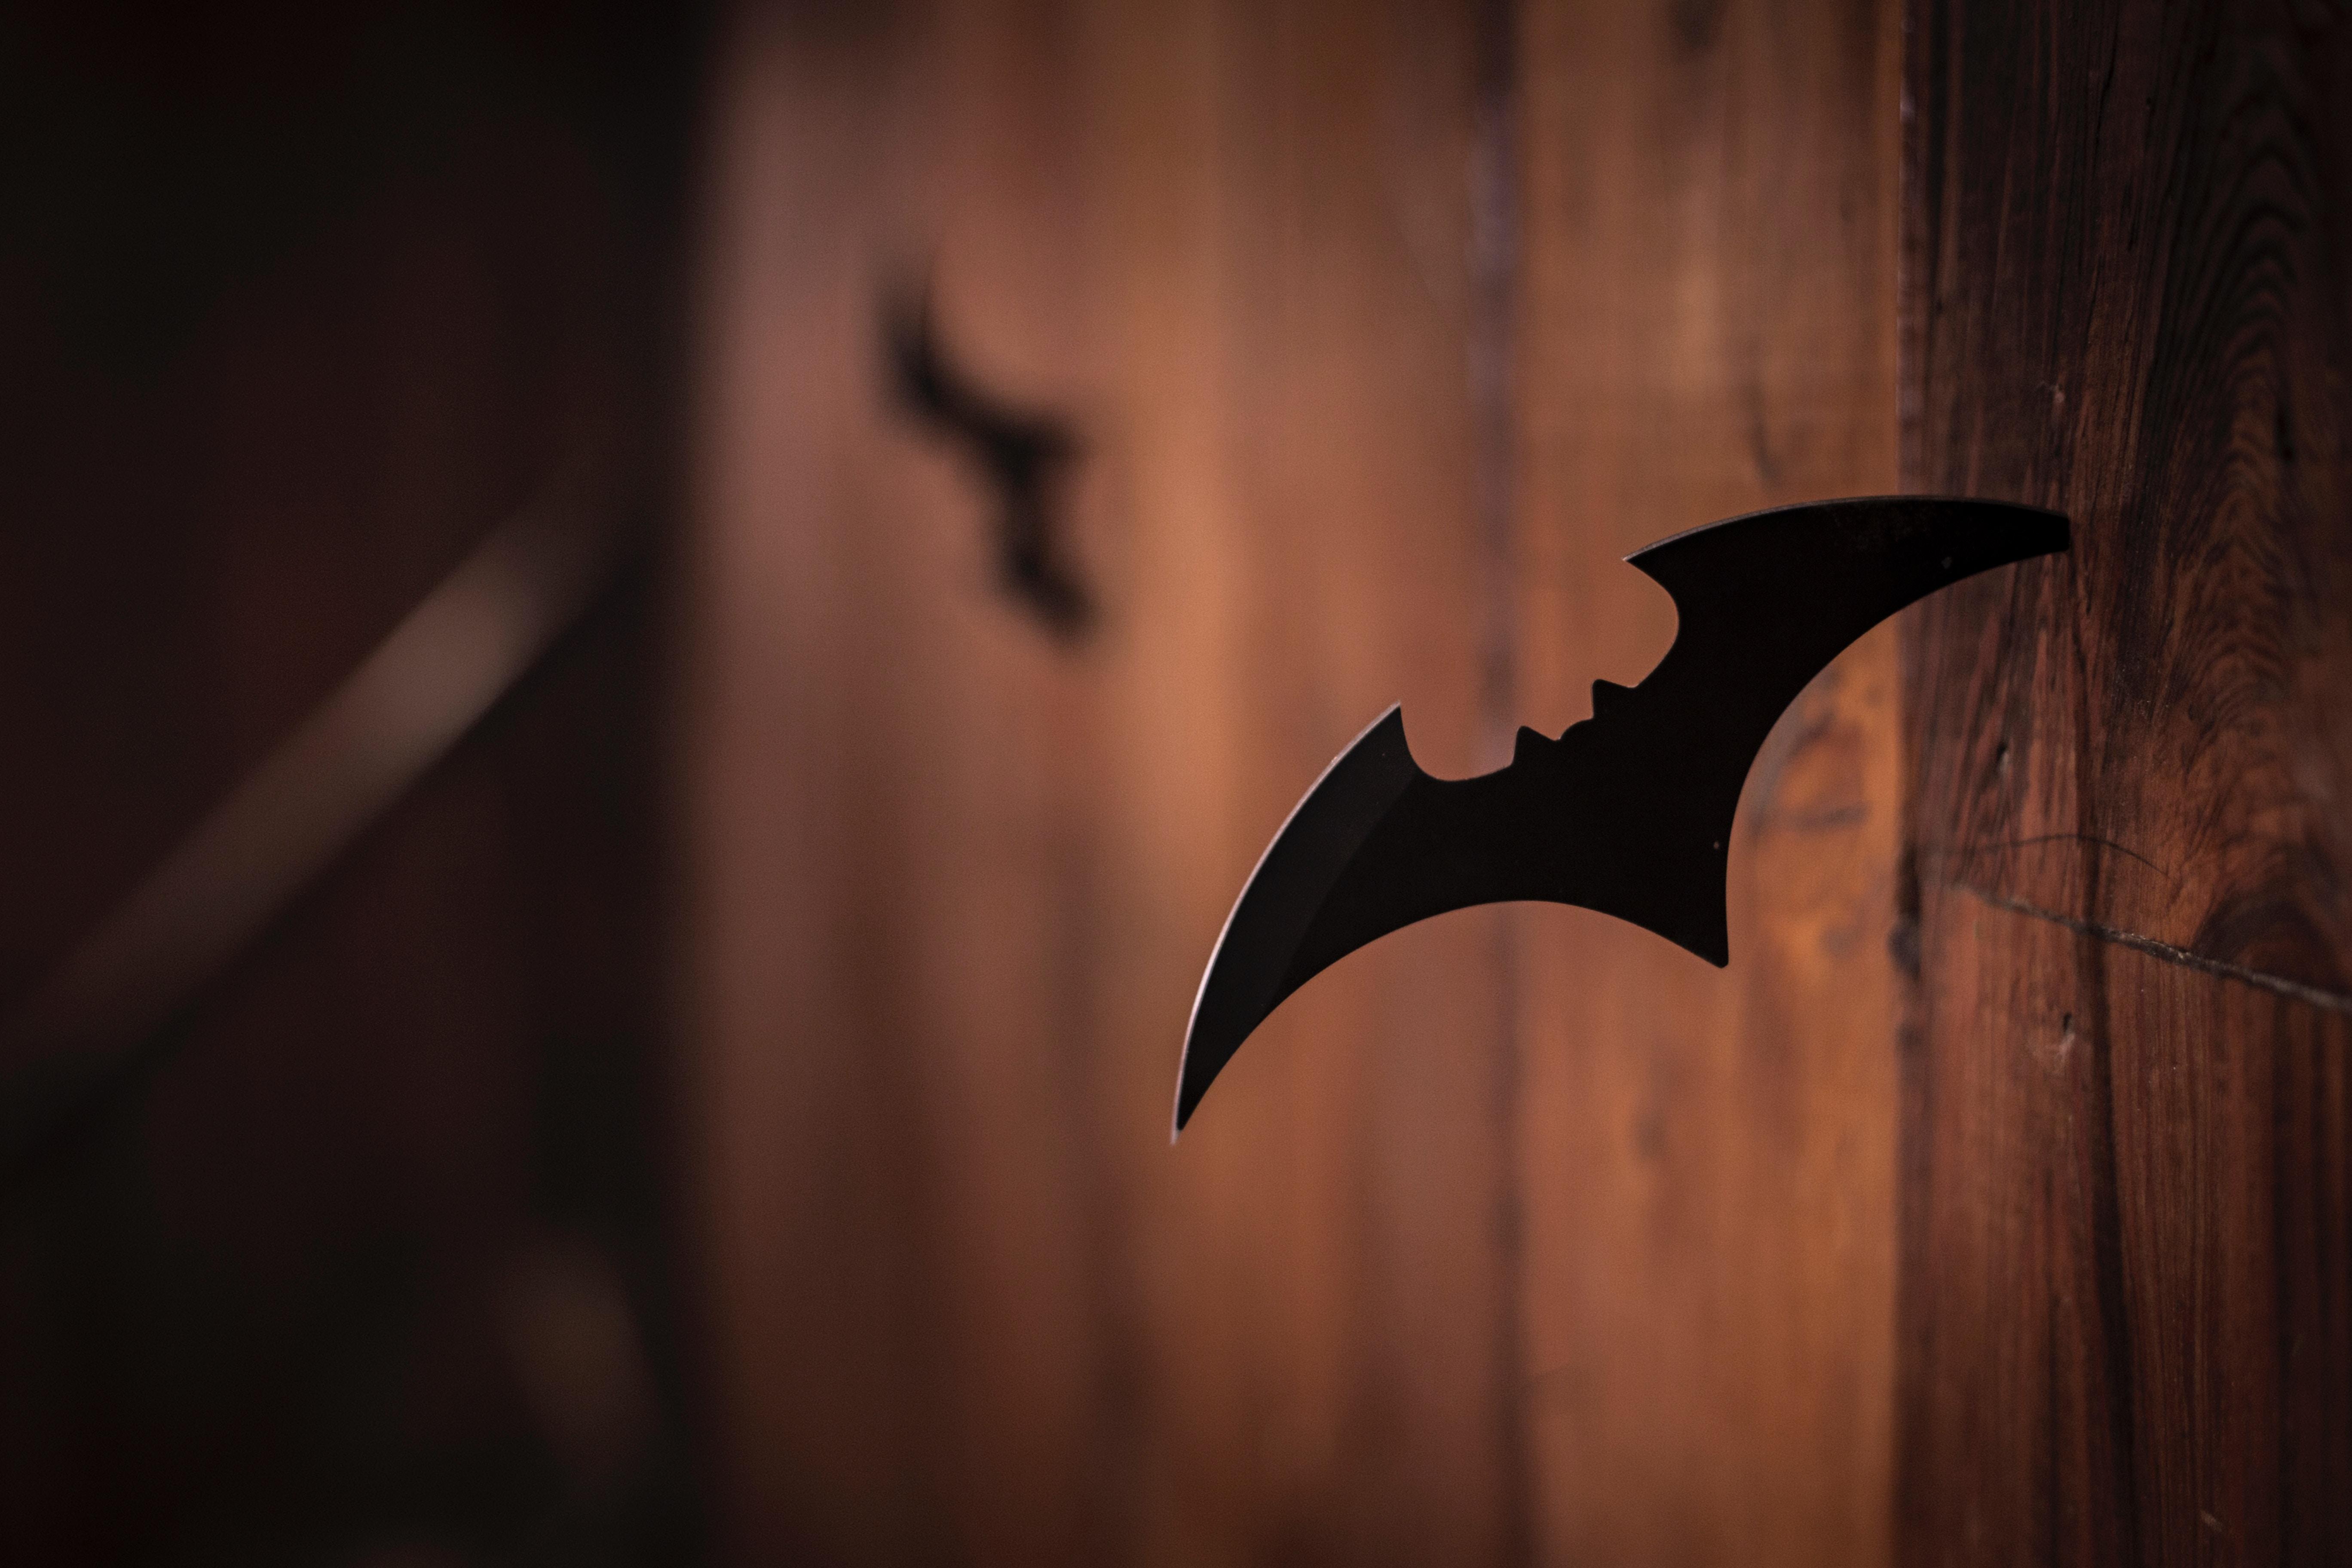 murcielago de halloween para decorar